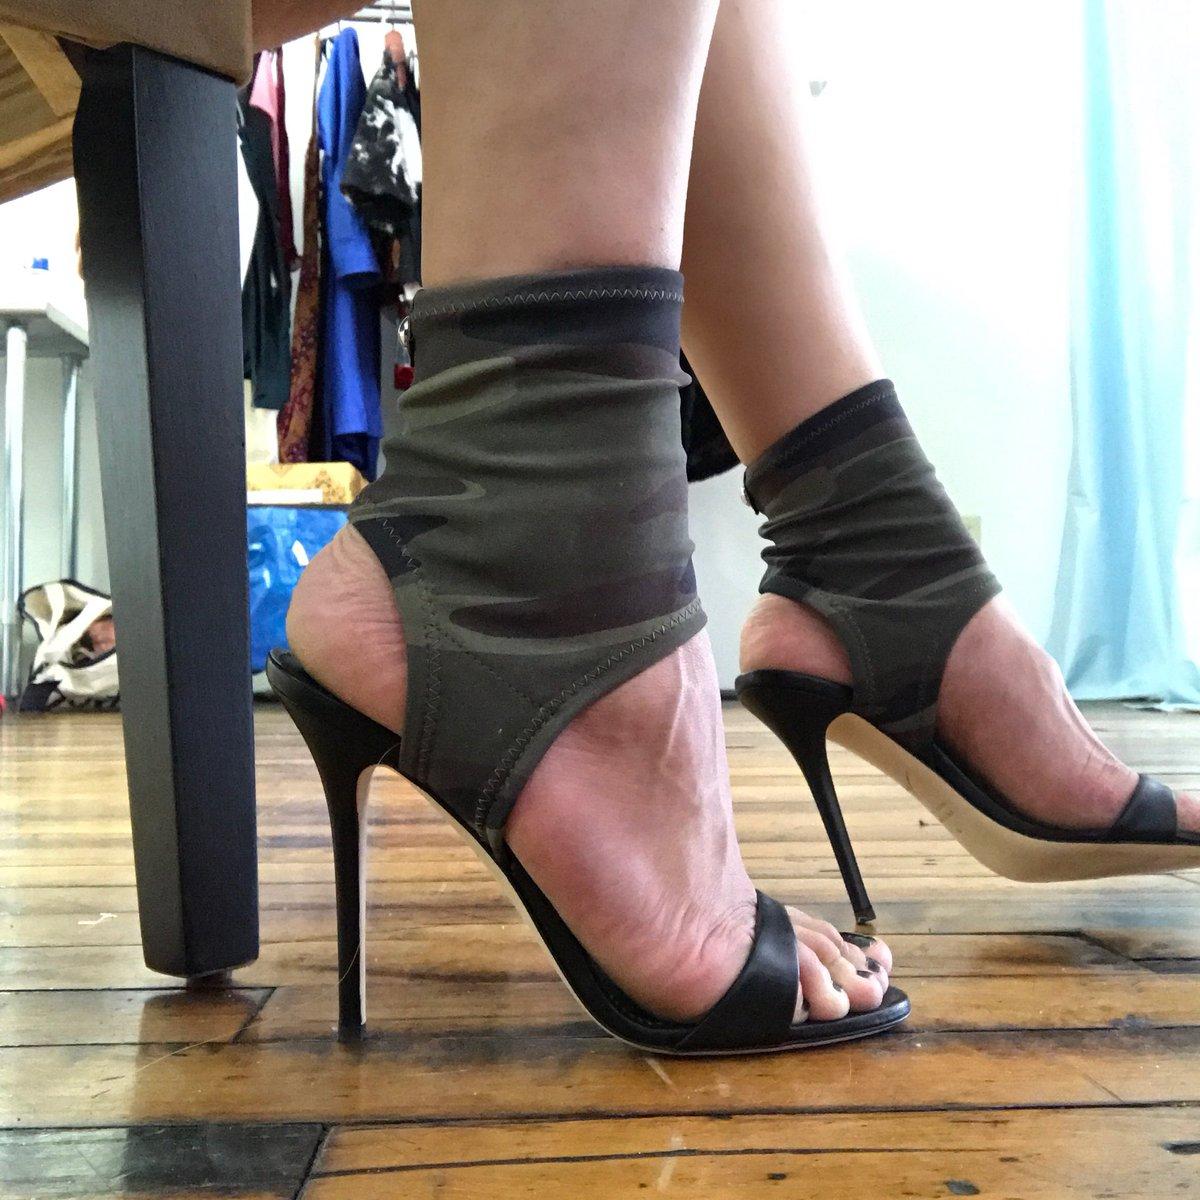 #giuseppezanotti today 👠 #footfetish #heelfetish #footworship qF5uClyTEg